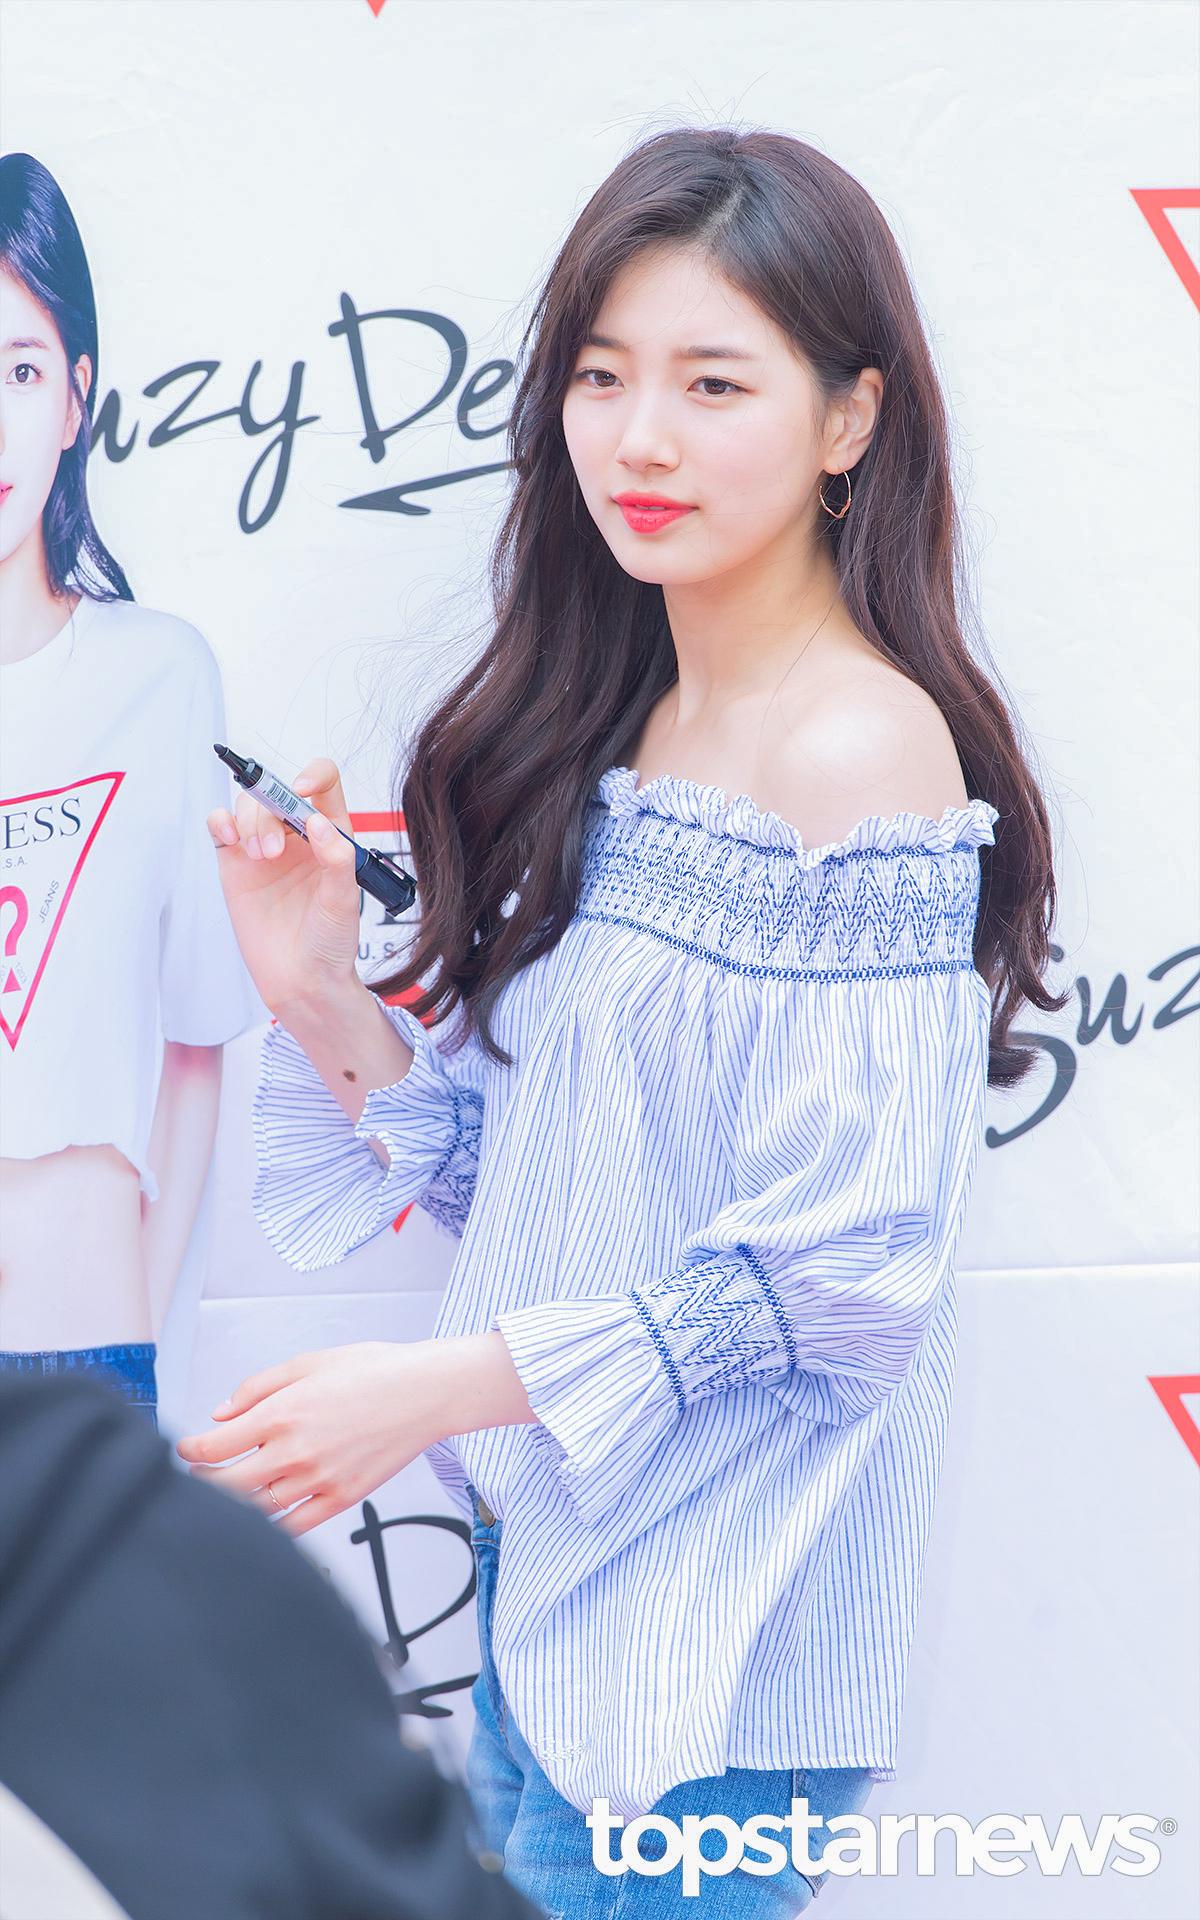 https://i0.wp.com/kpopstuff.com/wp-content/uploads/2017/05/korea-korean-kpop-idol-girl-group-band-miss-a-suzys-spring-outfit-look-blue-off-the-shoulder-top-casual-fashion-style-girls-women-kpopstuff.jpg